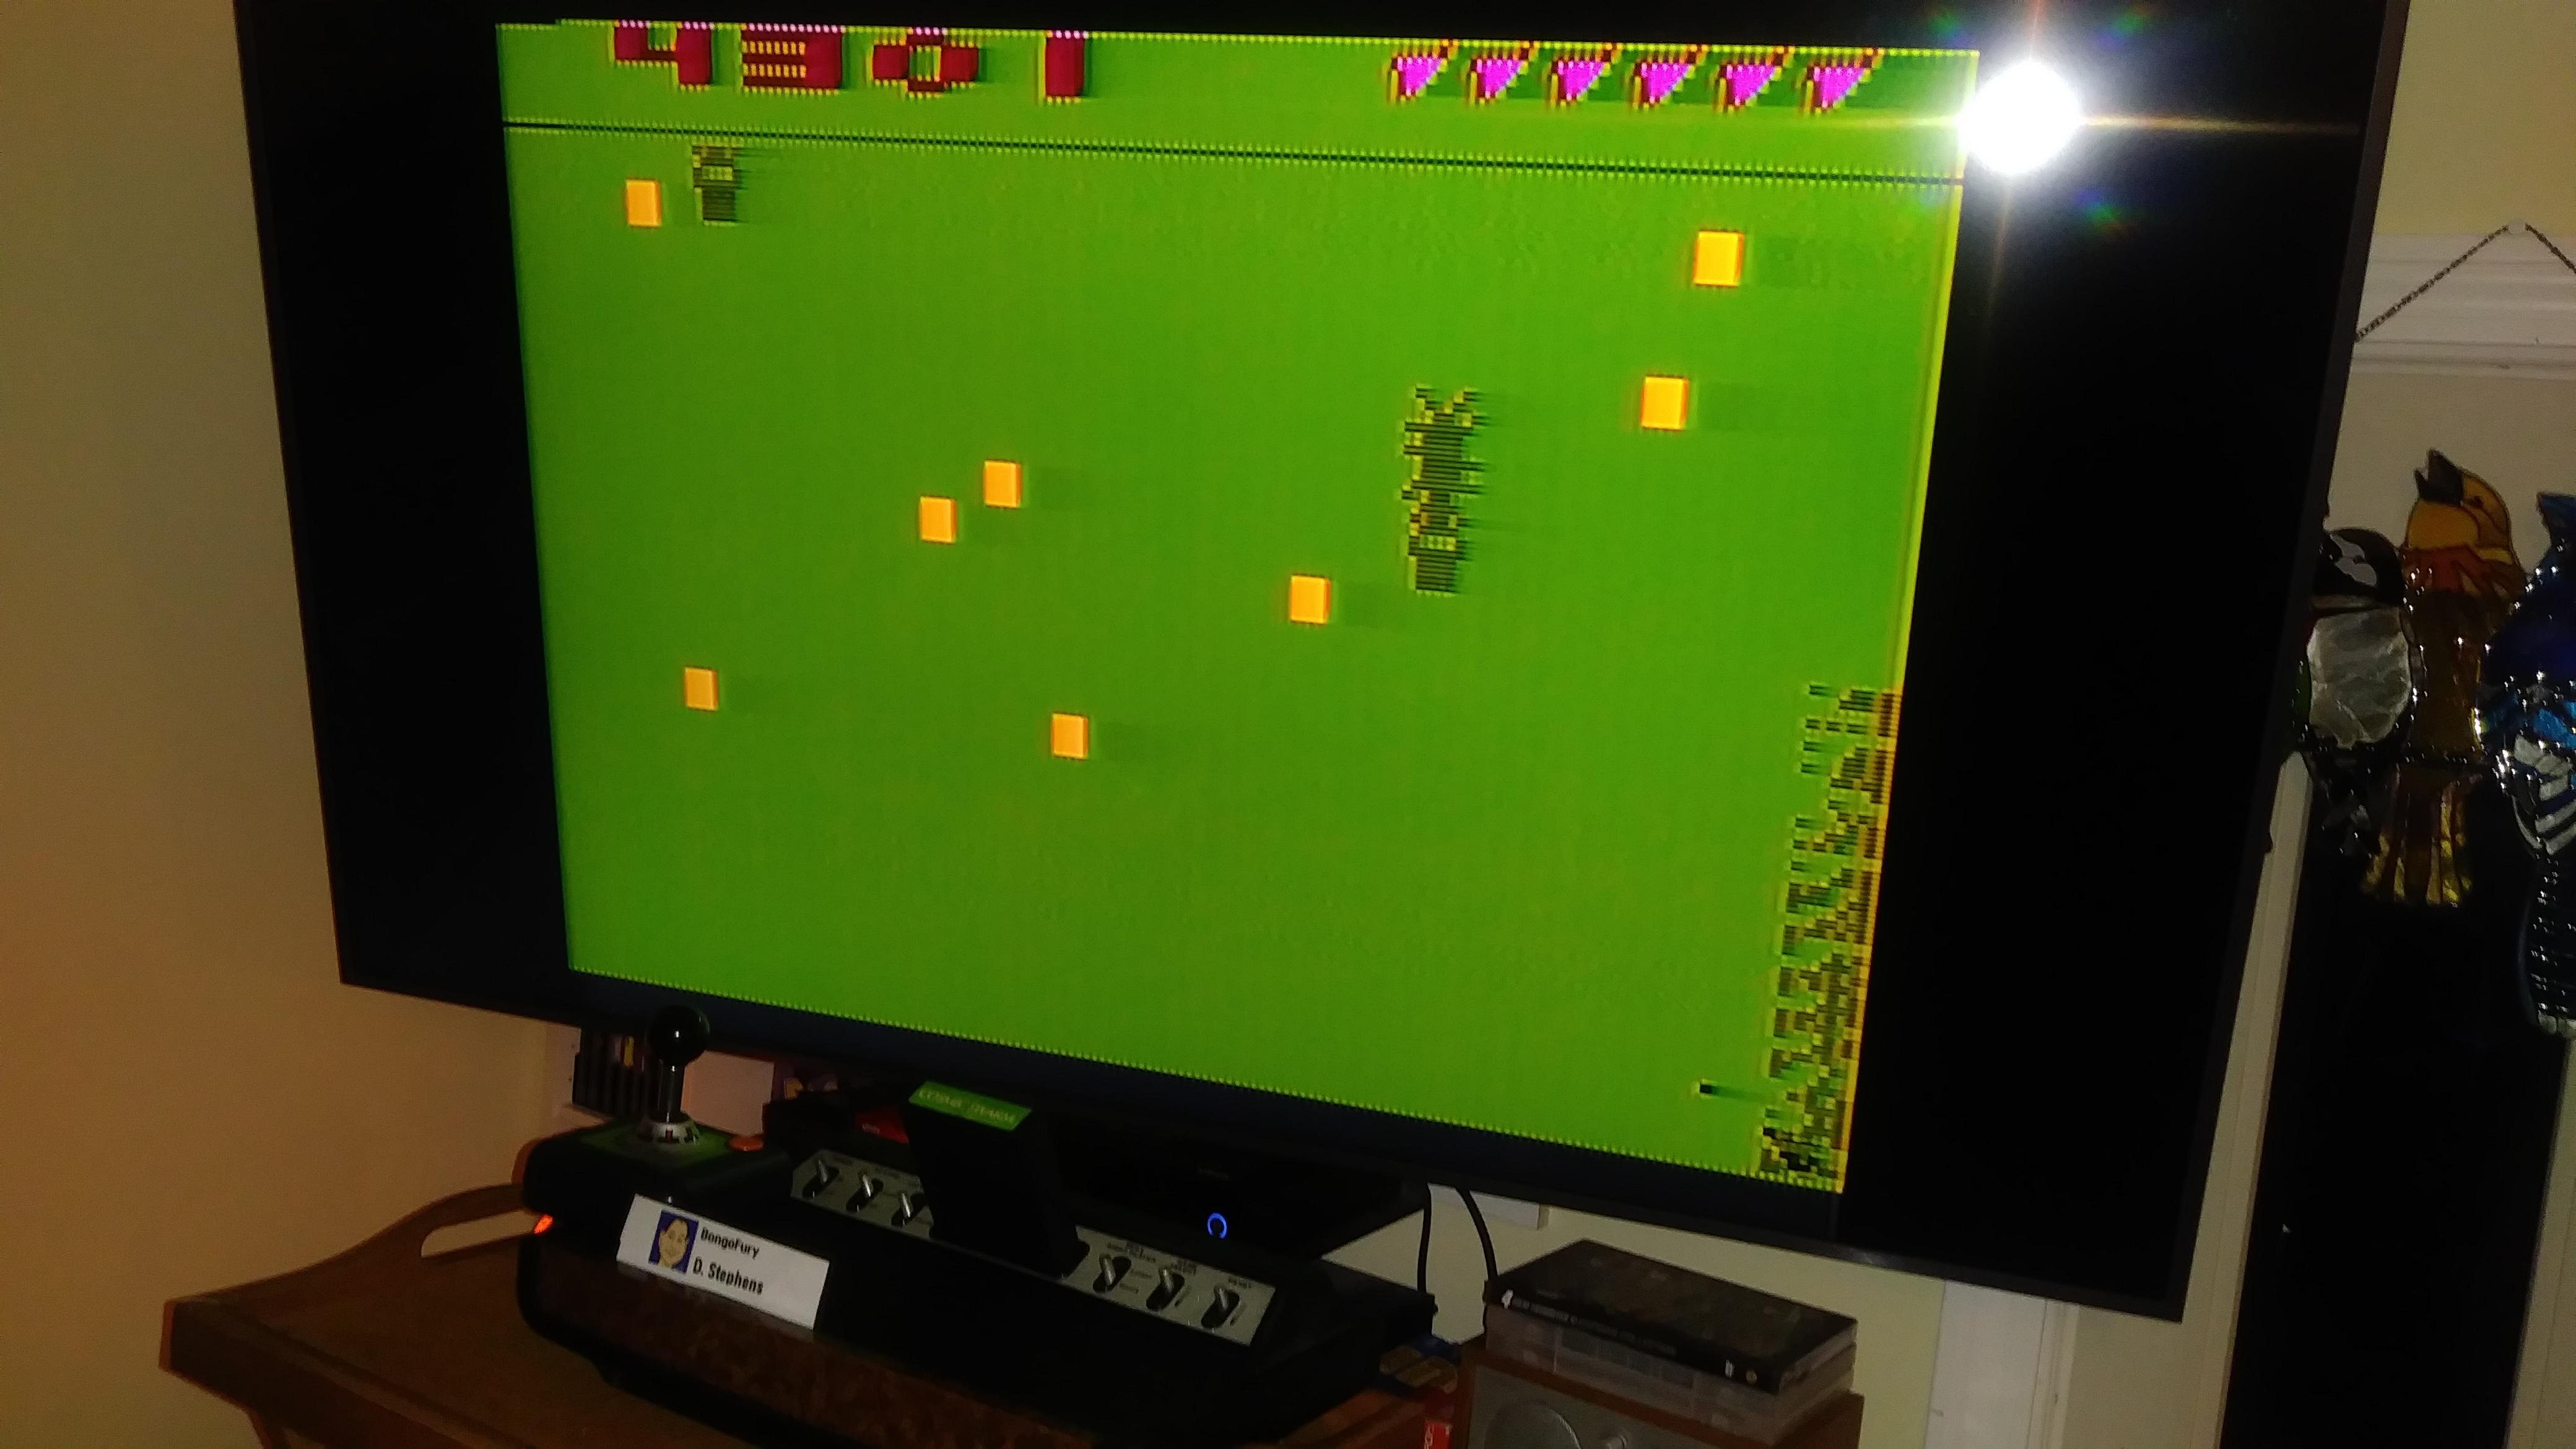 BongoFury: Cosmic Swarm (Atari 2600 Novice/B) 4,301 points on 2019-11-07 18:45:44